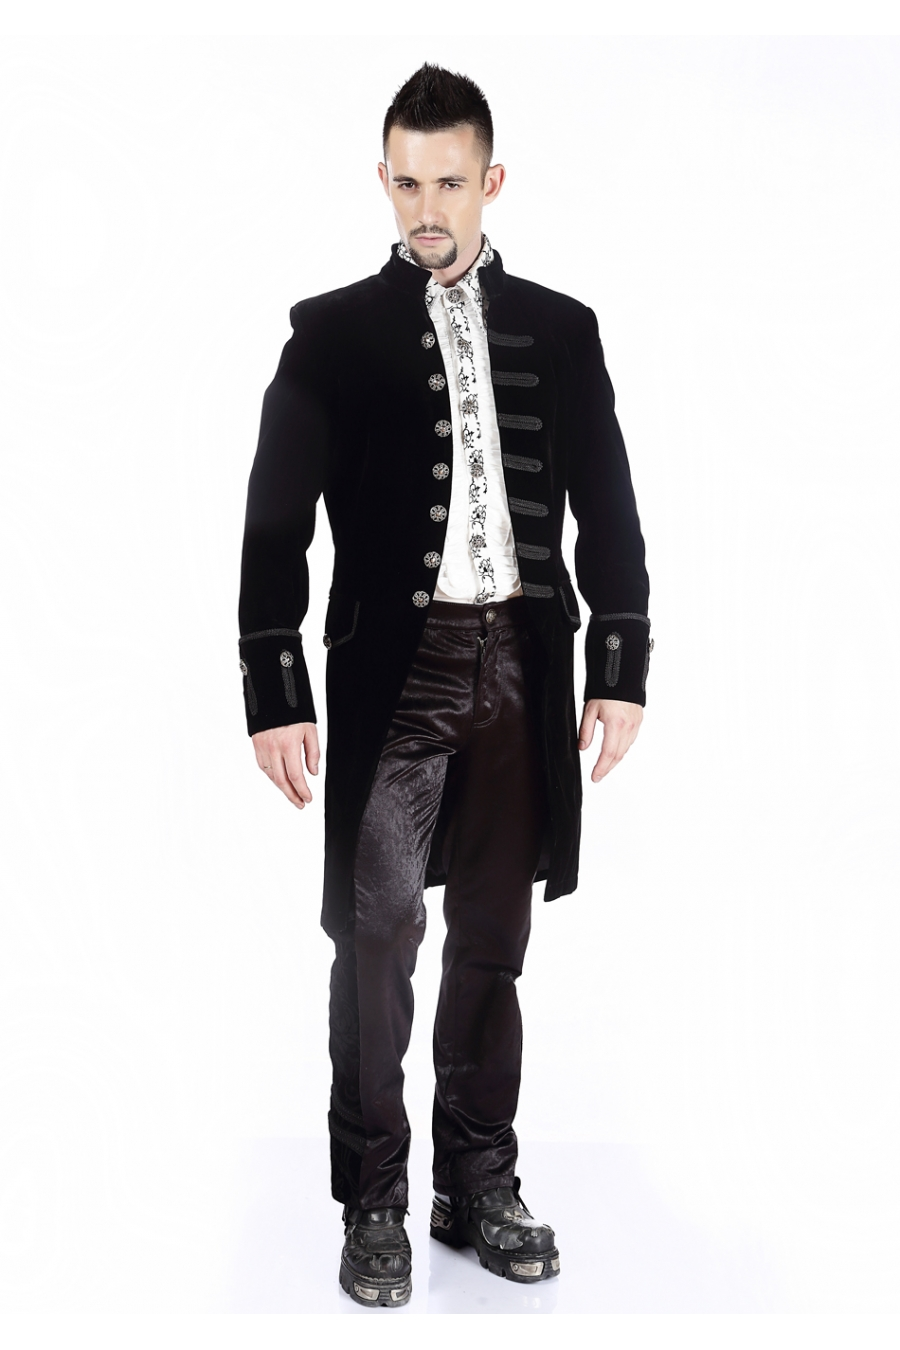 Comment créer sa tenue Steampunk (Spécial Hommes)   French Steampunk ... c4c6dbe167d